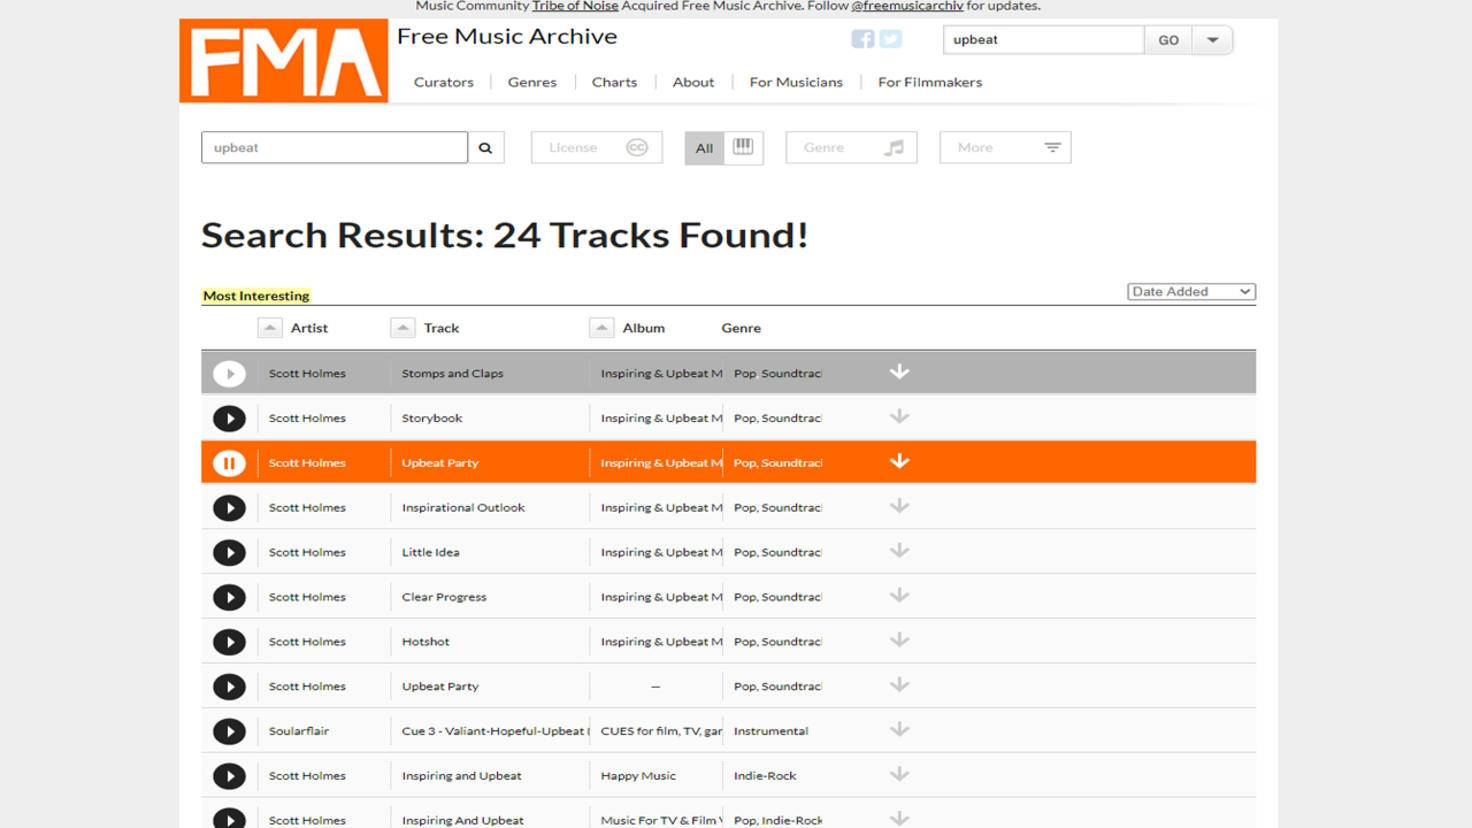 Free Music Archive lizenzfreie Musik